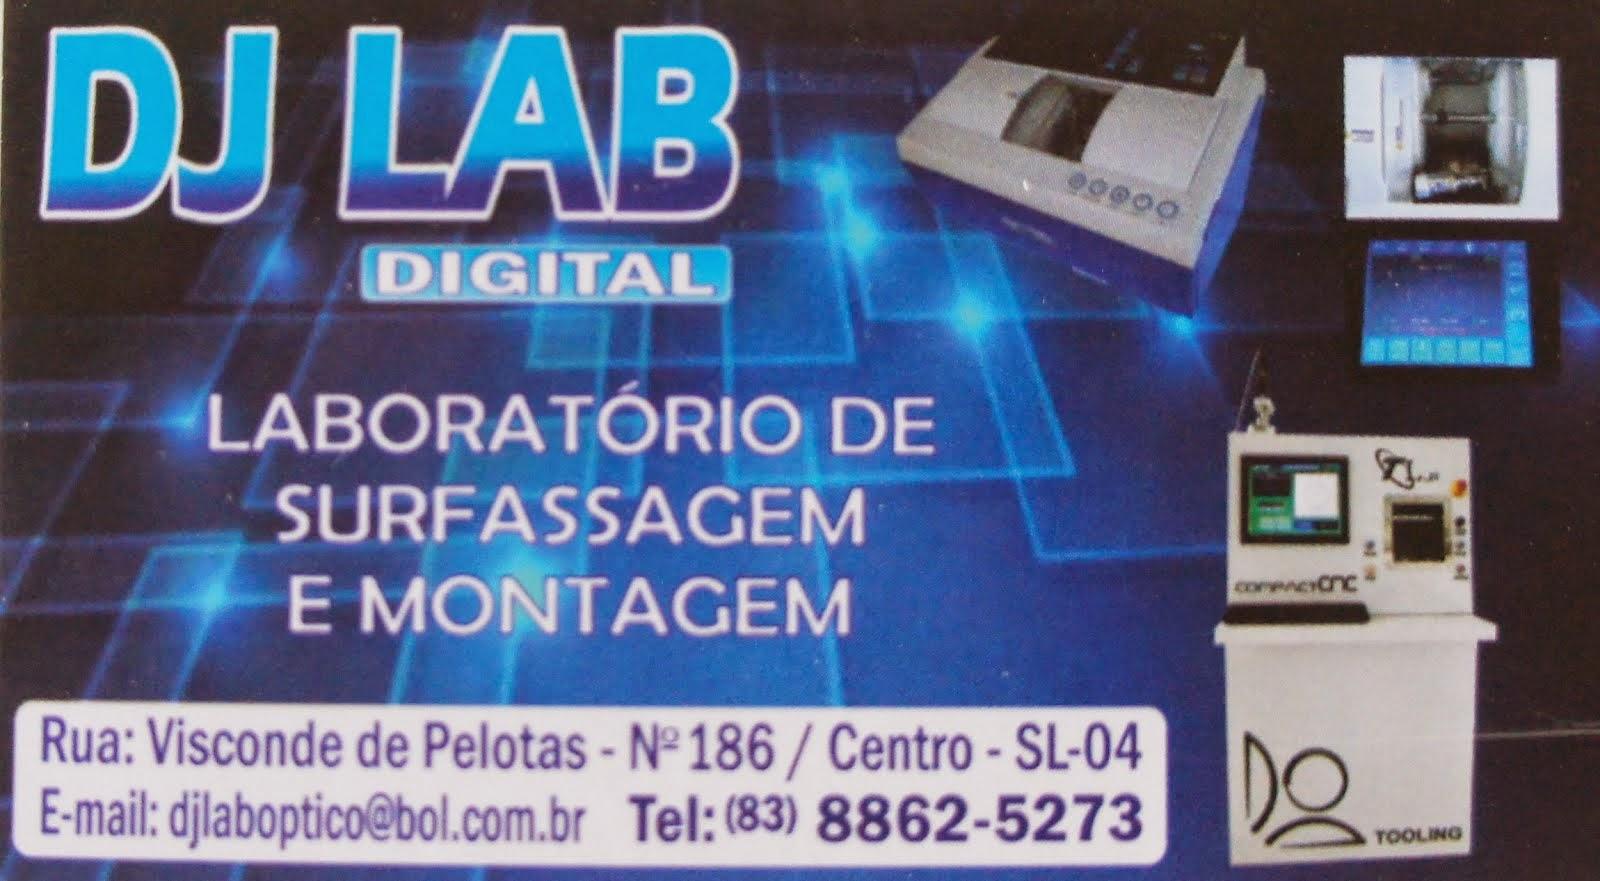 DJ LAB DIGITAL